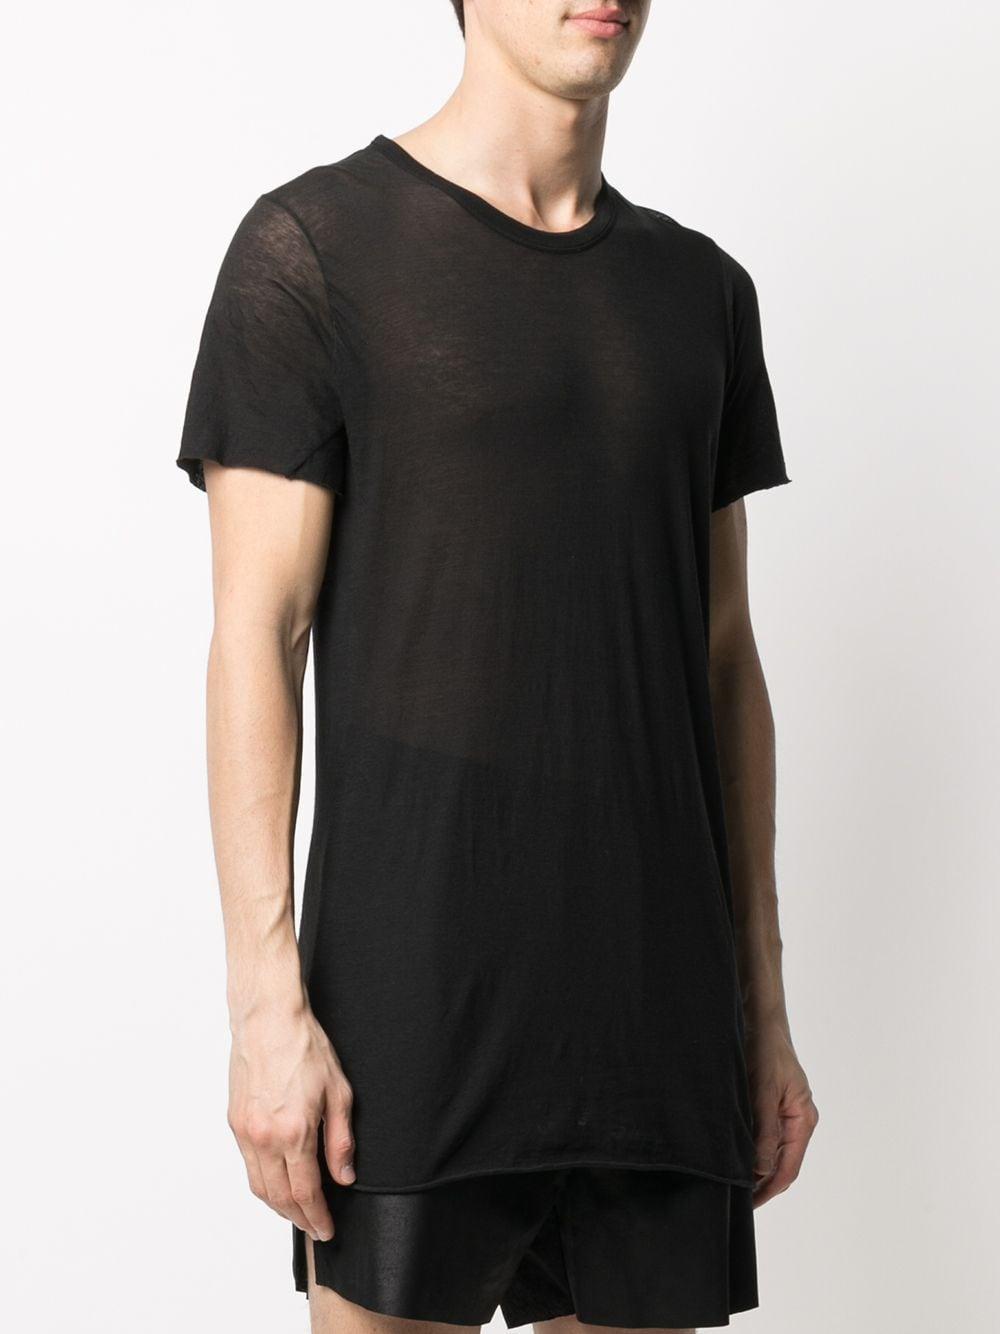 T-Shirt Semi-Trasparente Nero Uomo Cotone RICK OWENS | T-shirt | RU21S6251 UC09